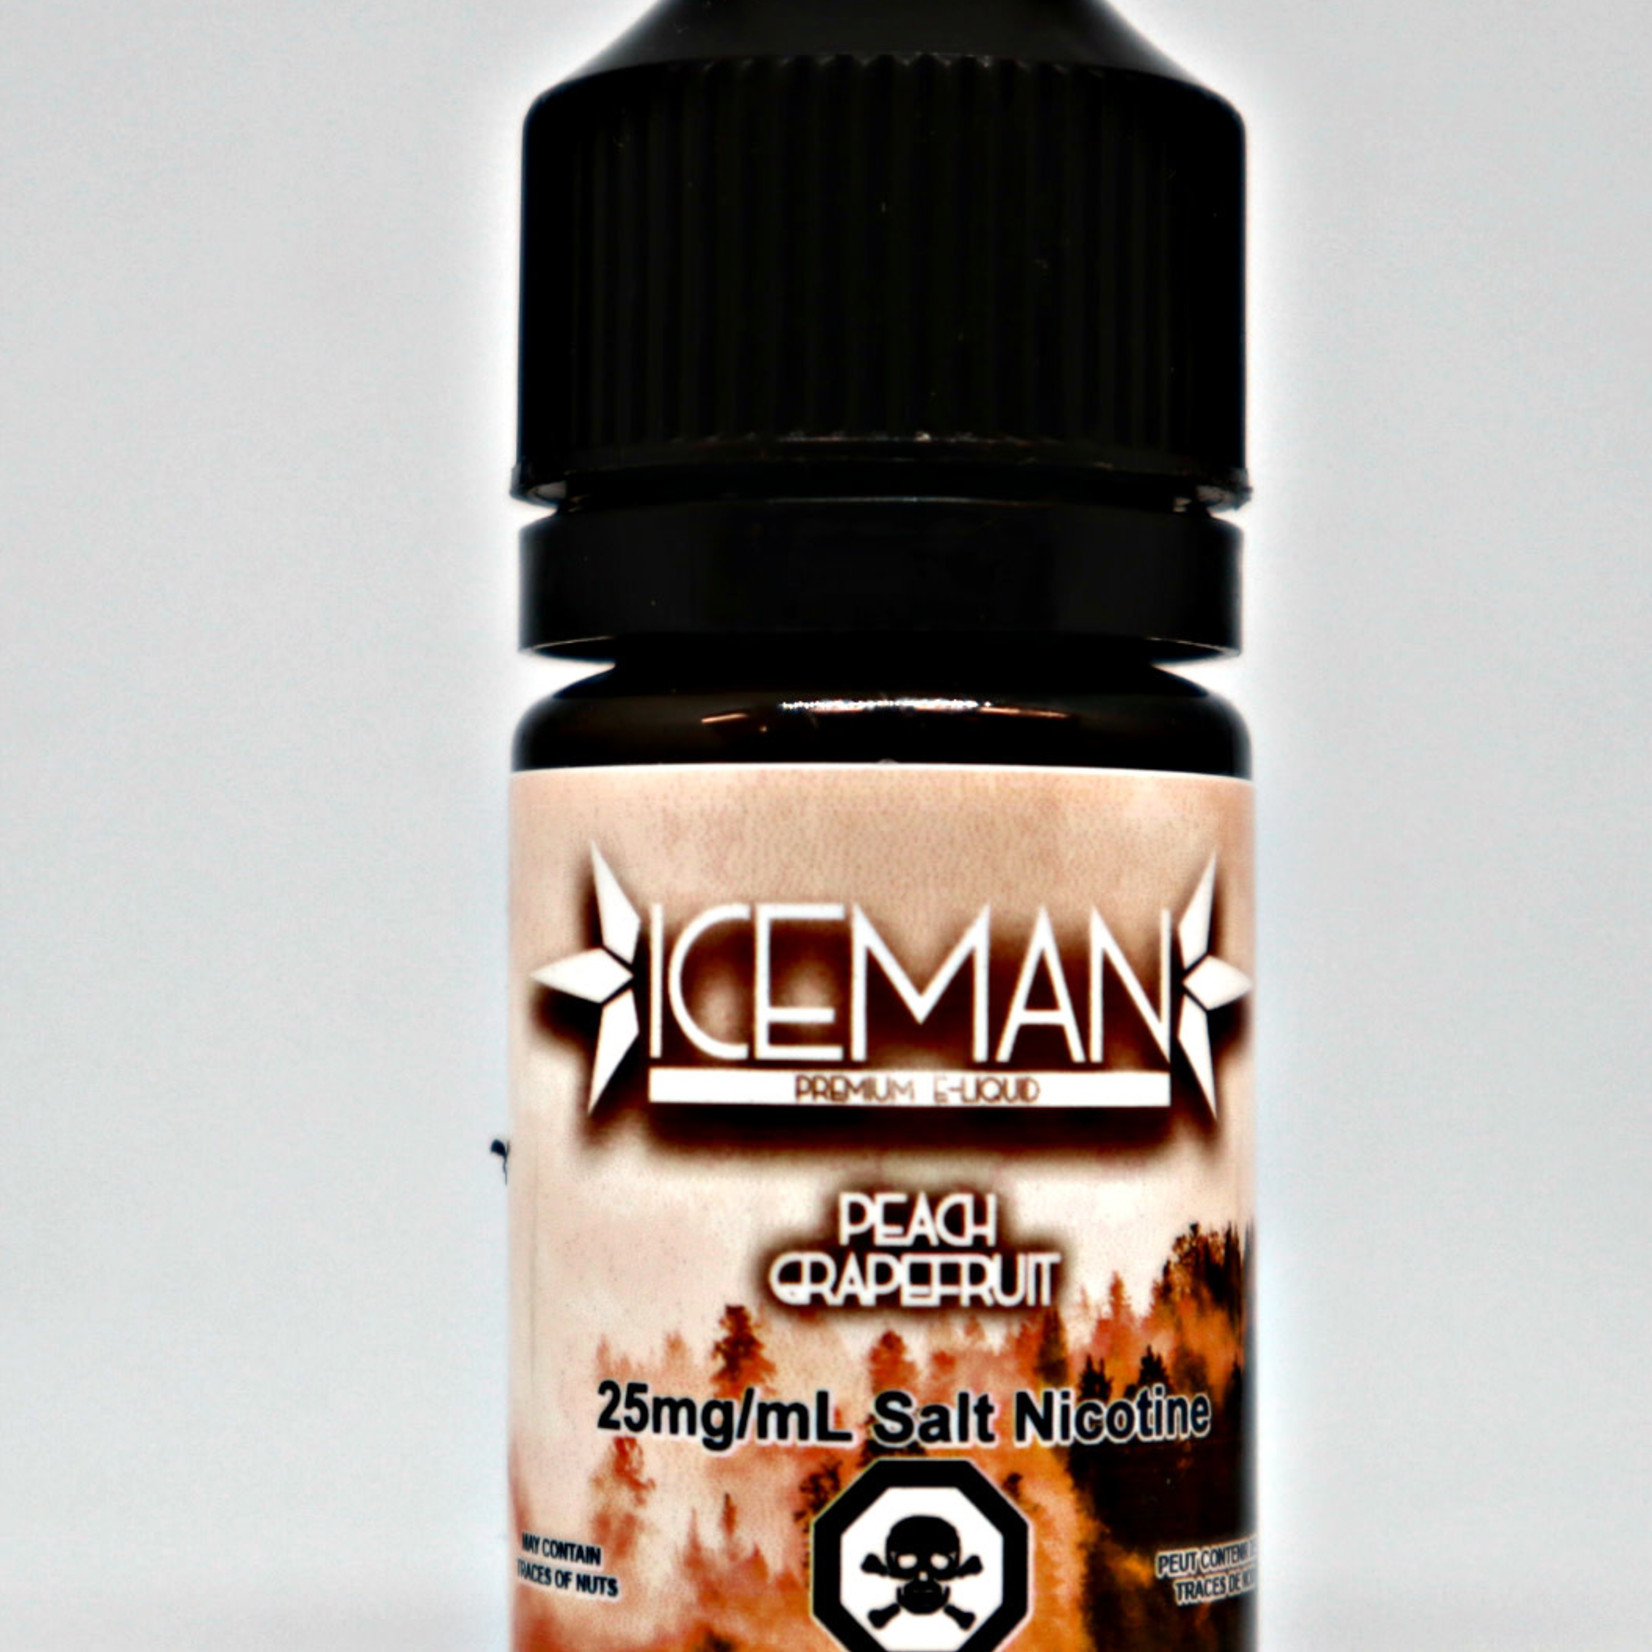 Iceman Grapefruit Peach Salt